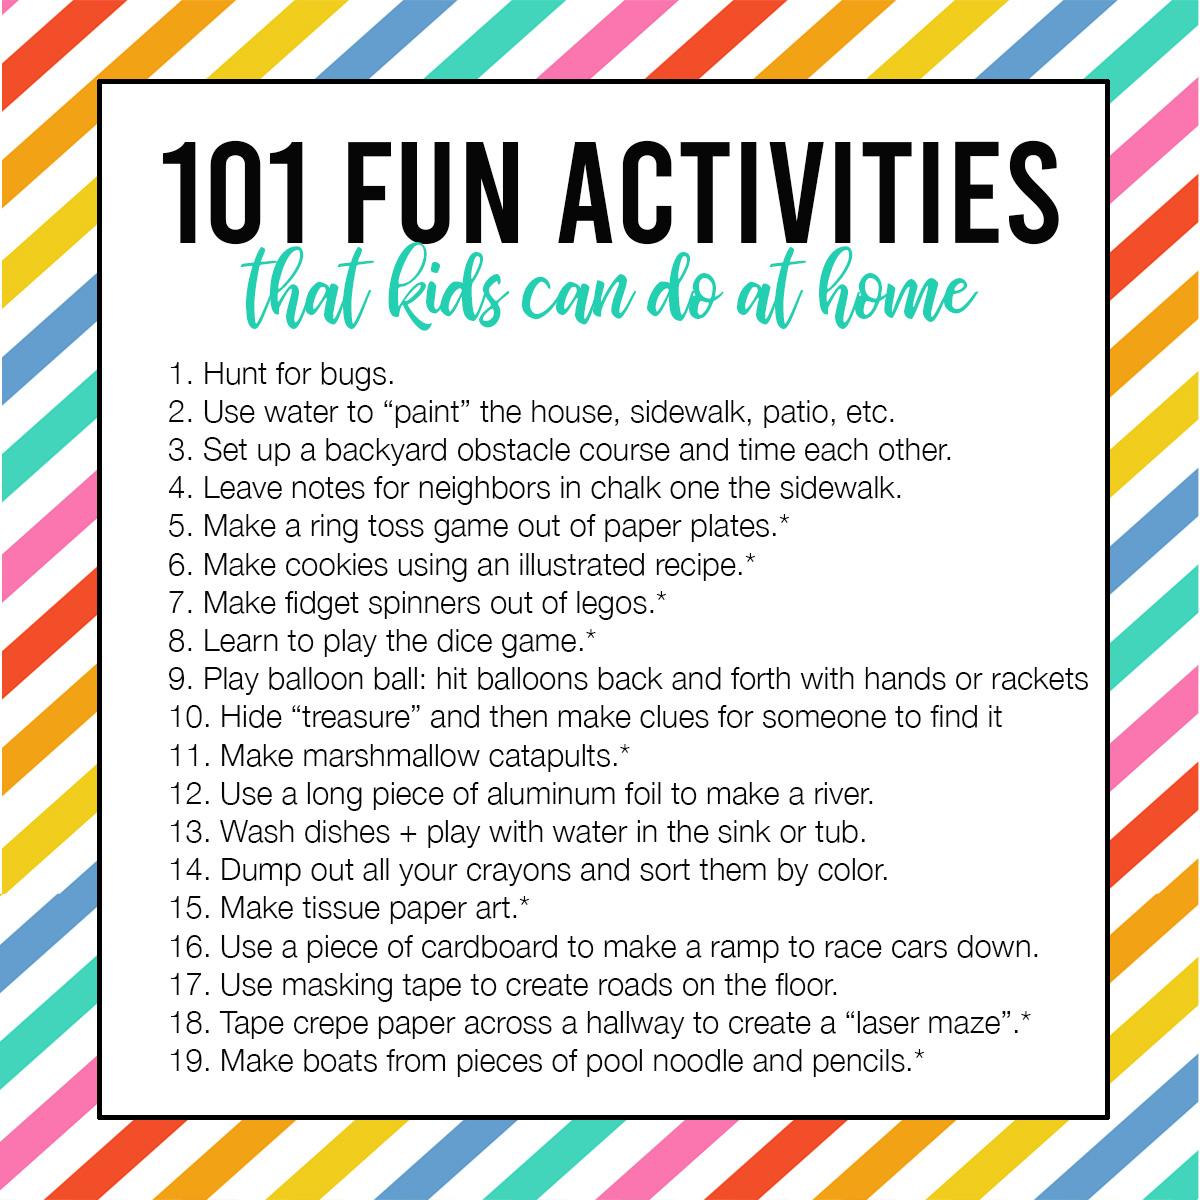 101 fun + light activities kids can do at home